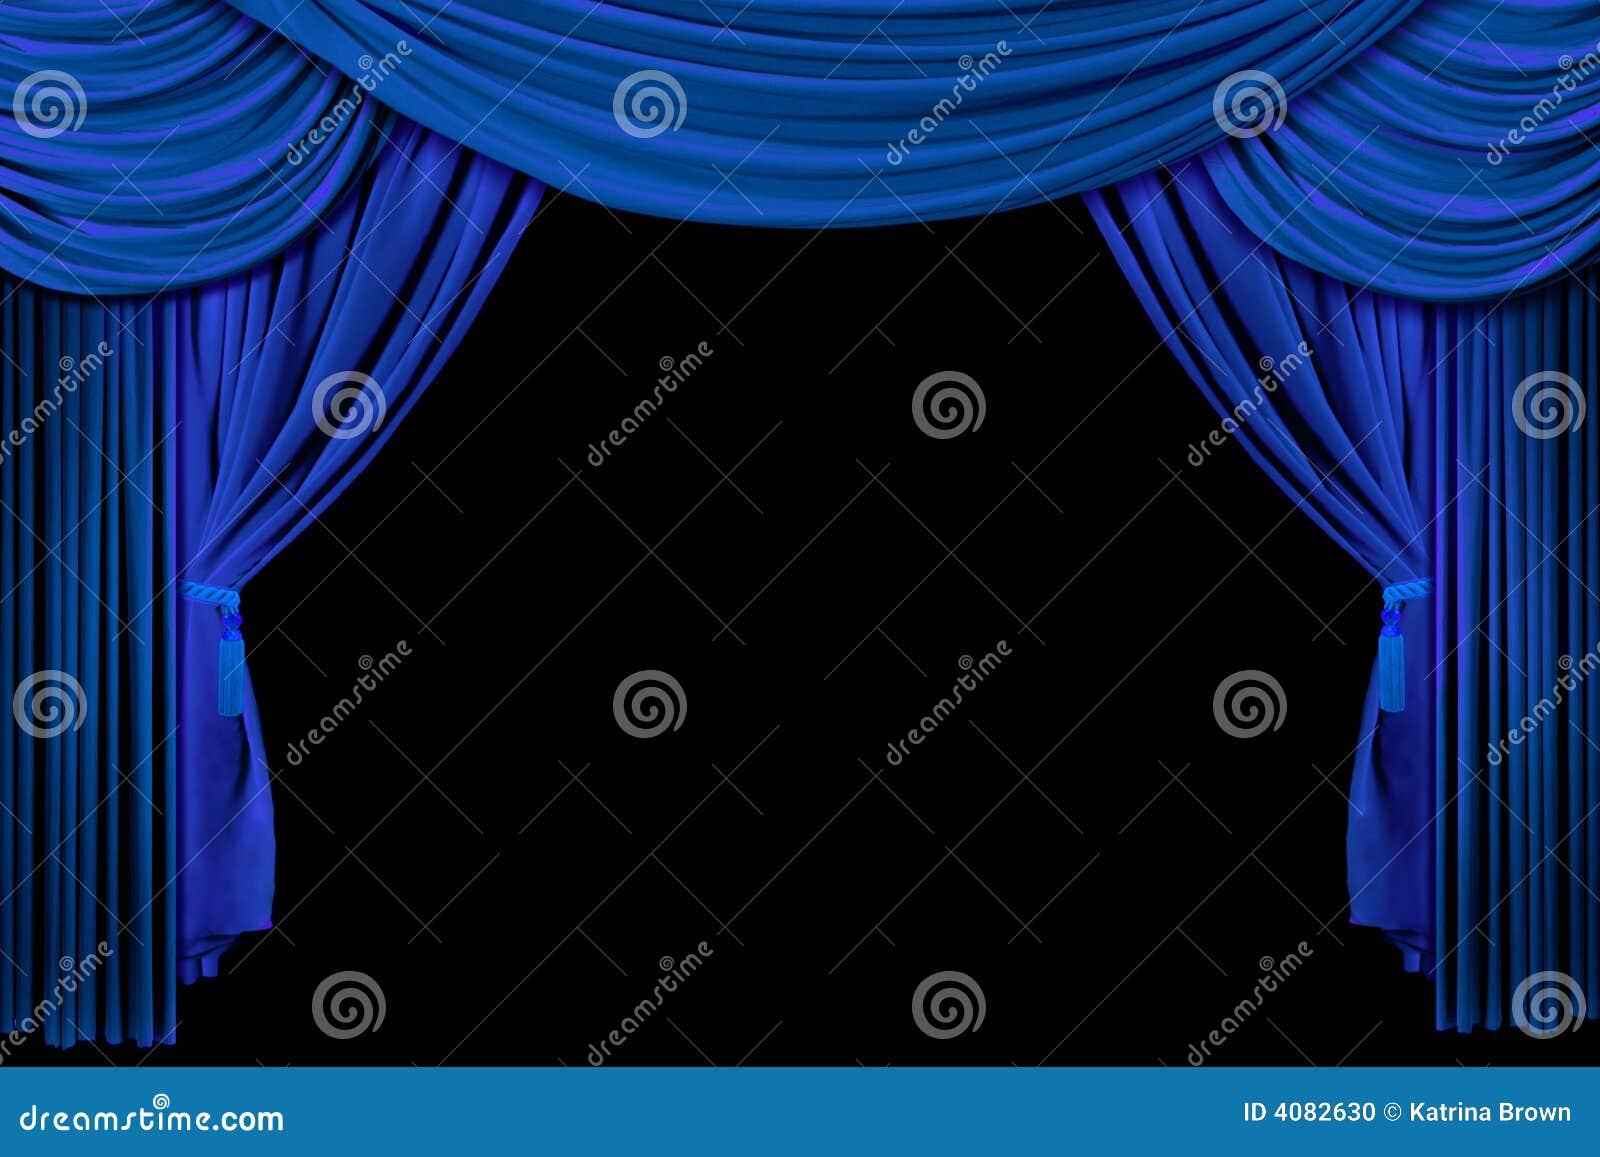 Black theatre curtain - Royalty Free Stock Photo